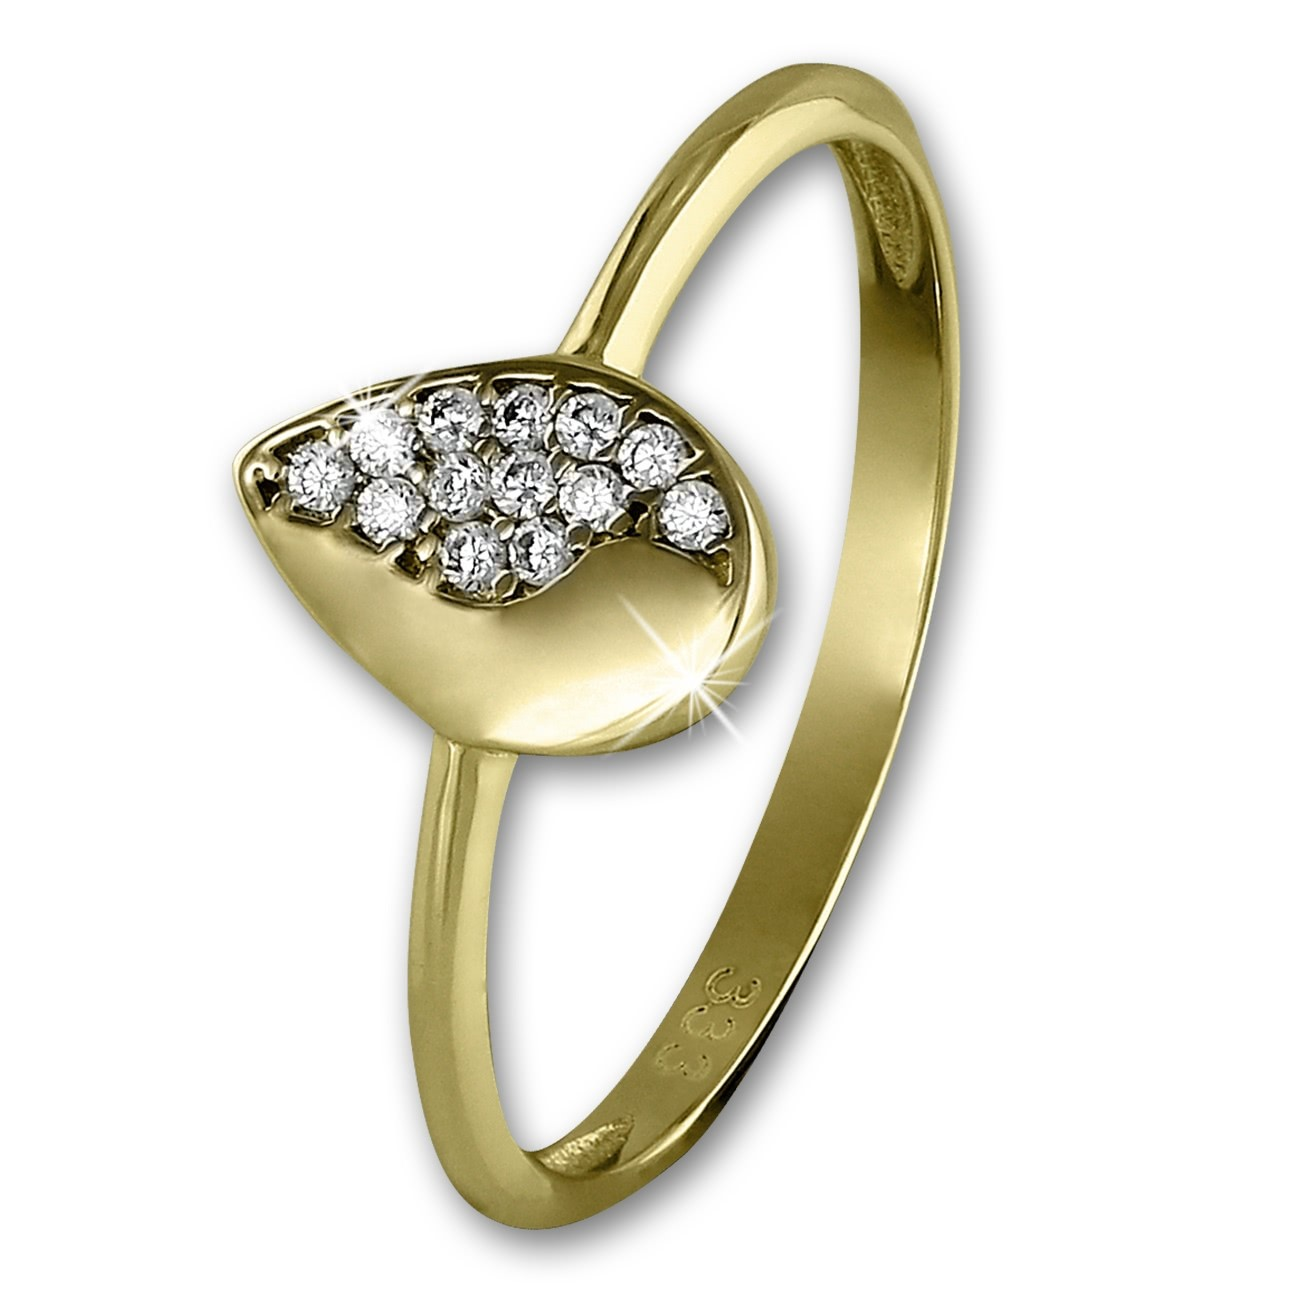 GoldDream Gold Ring Blatt Zirkonia weiß Gr.54 333er Gelbgold GDR506Y54